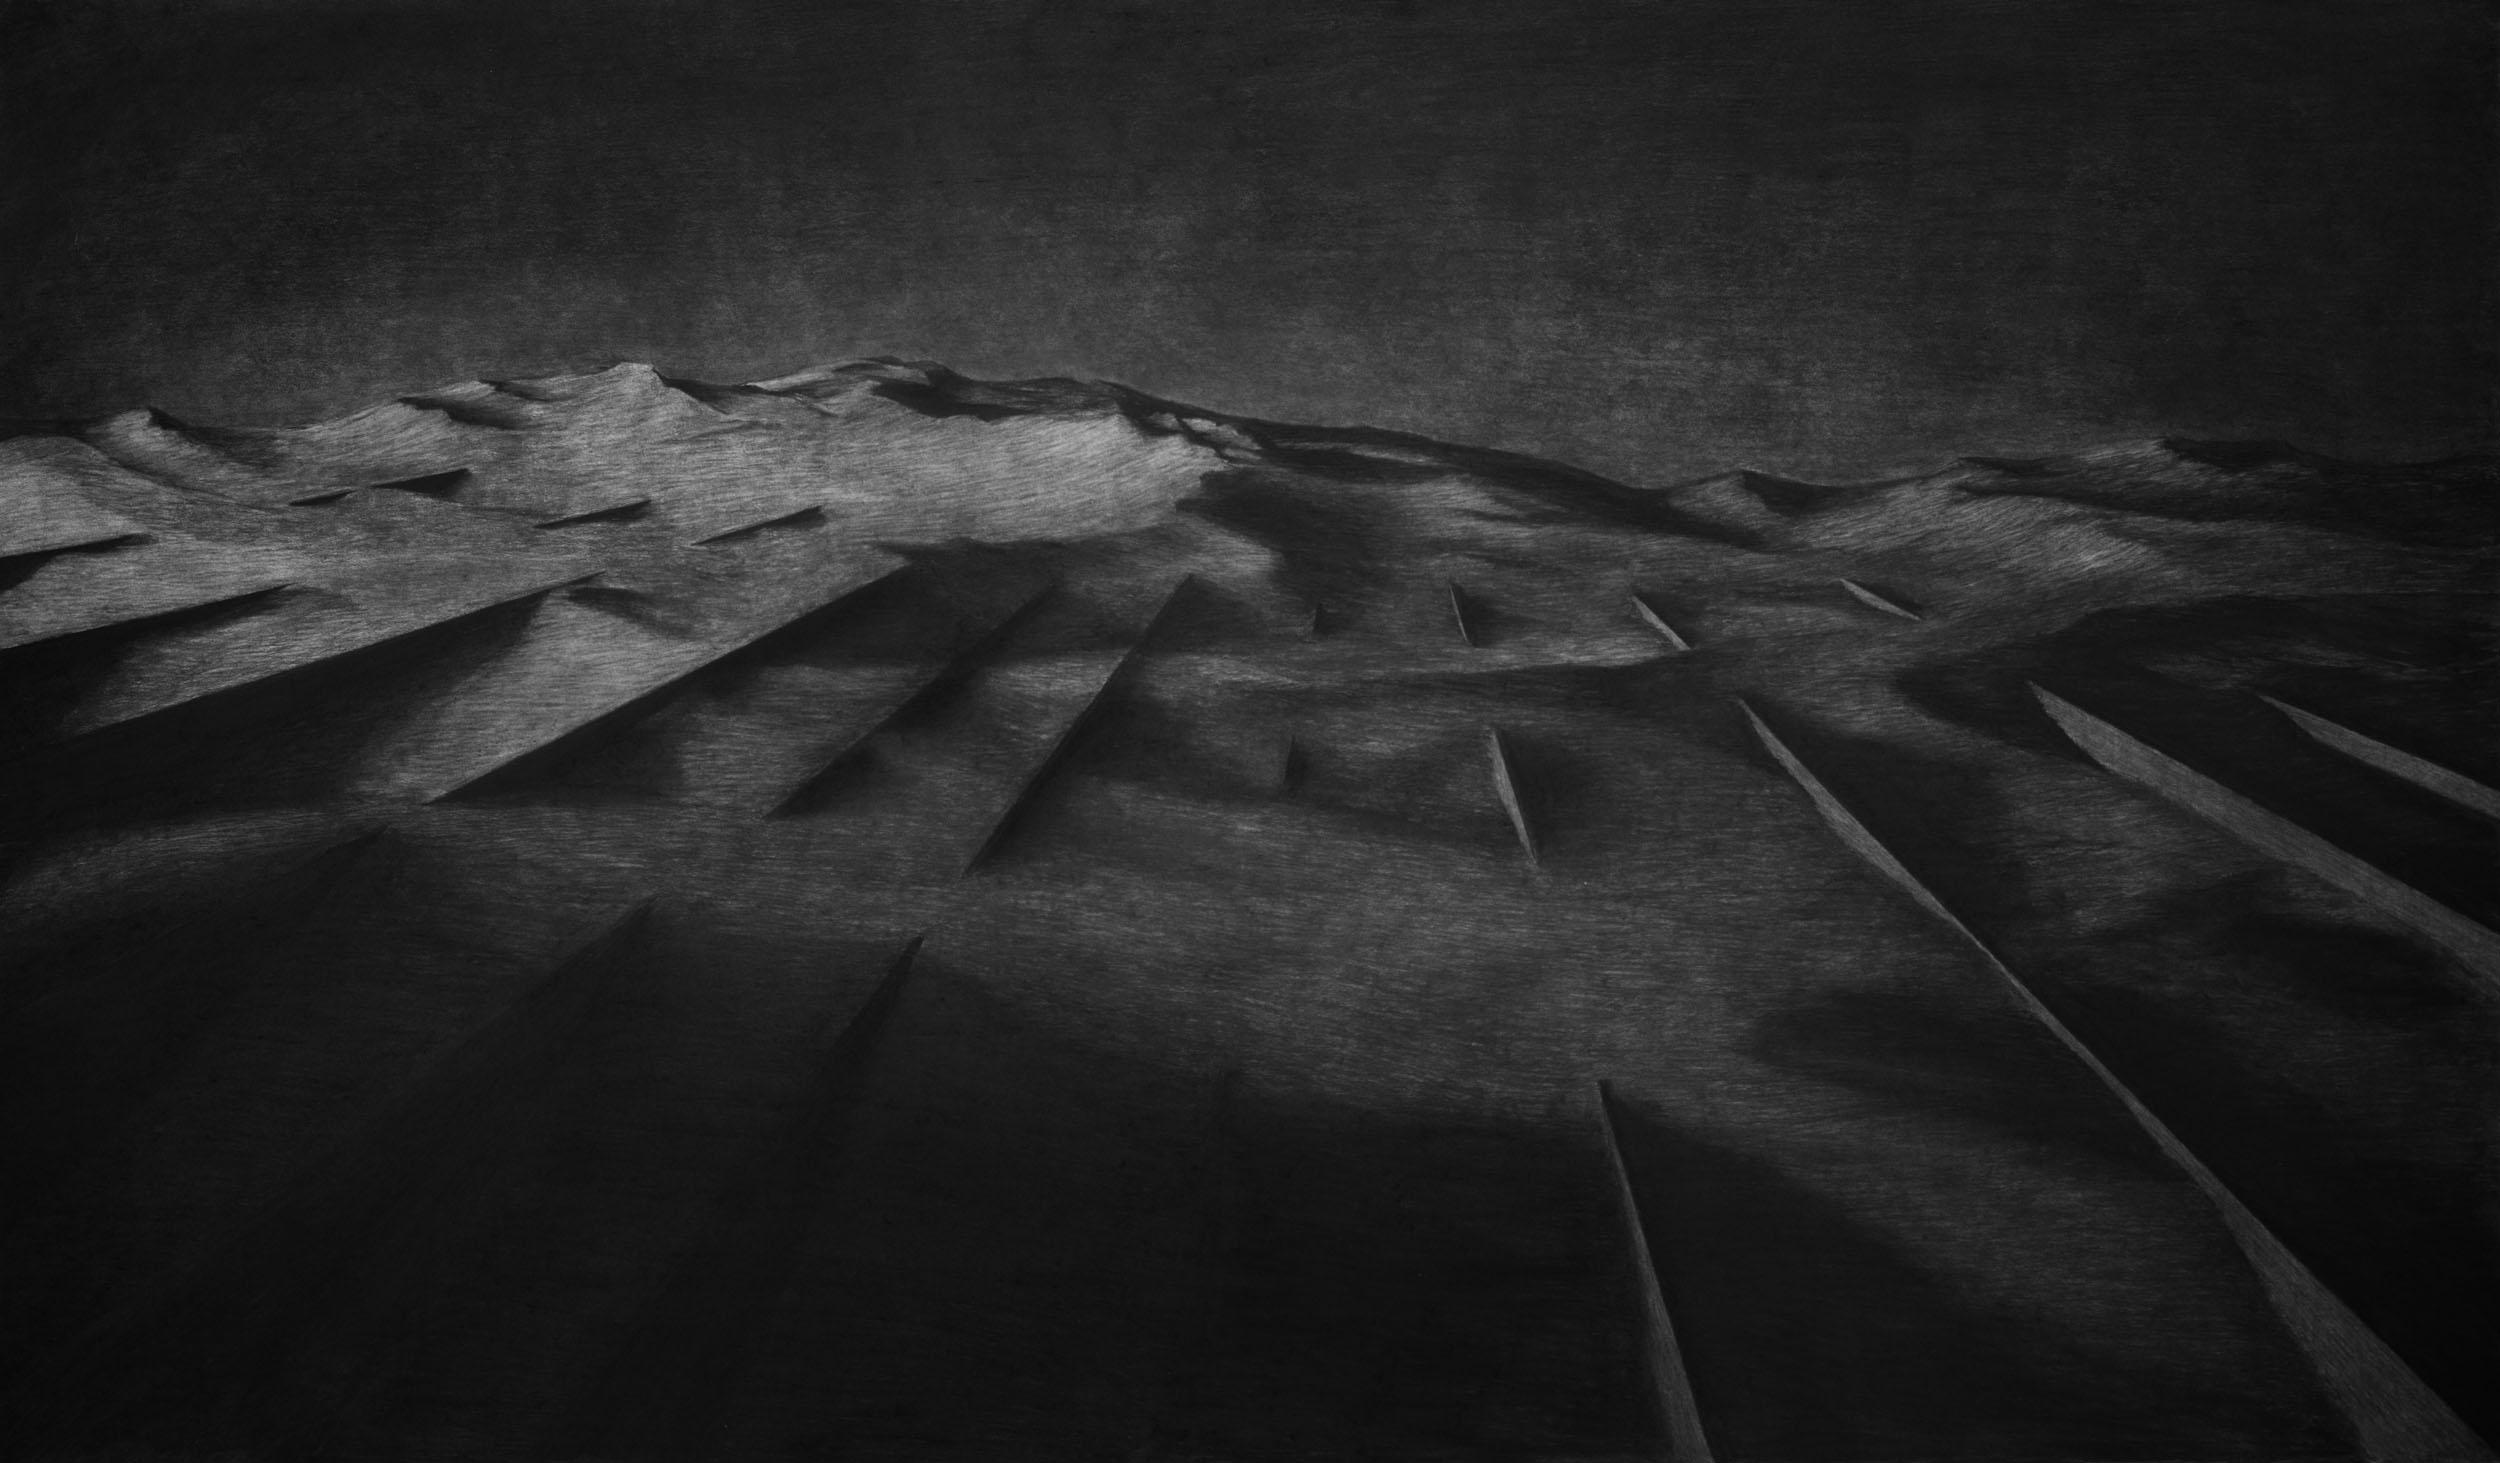 Charcoal drawing | 2016 | 205 x 120 cm